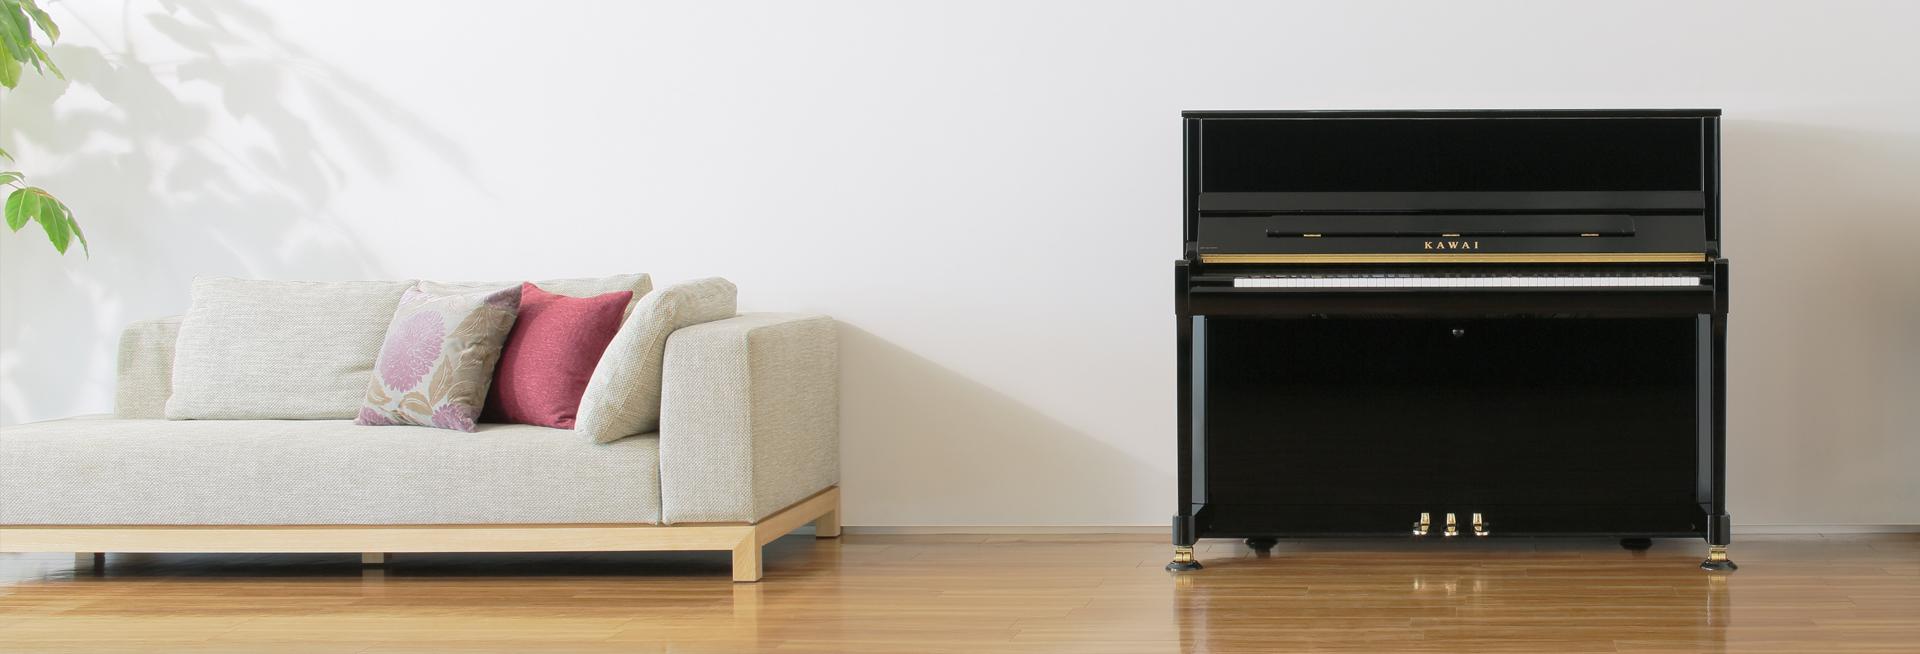 kawai-modern-art-room.web.banner.try.jpg